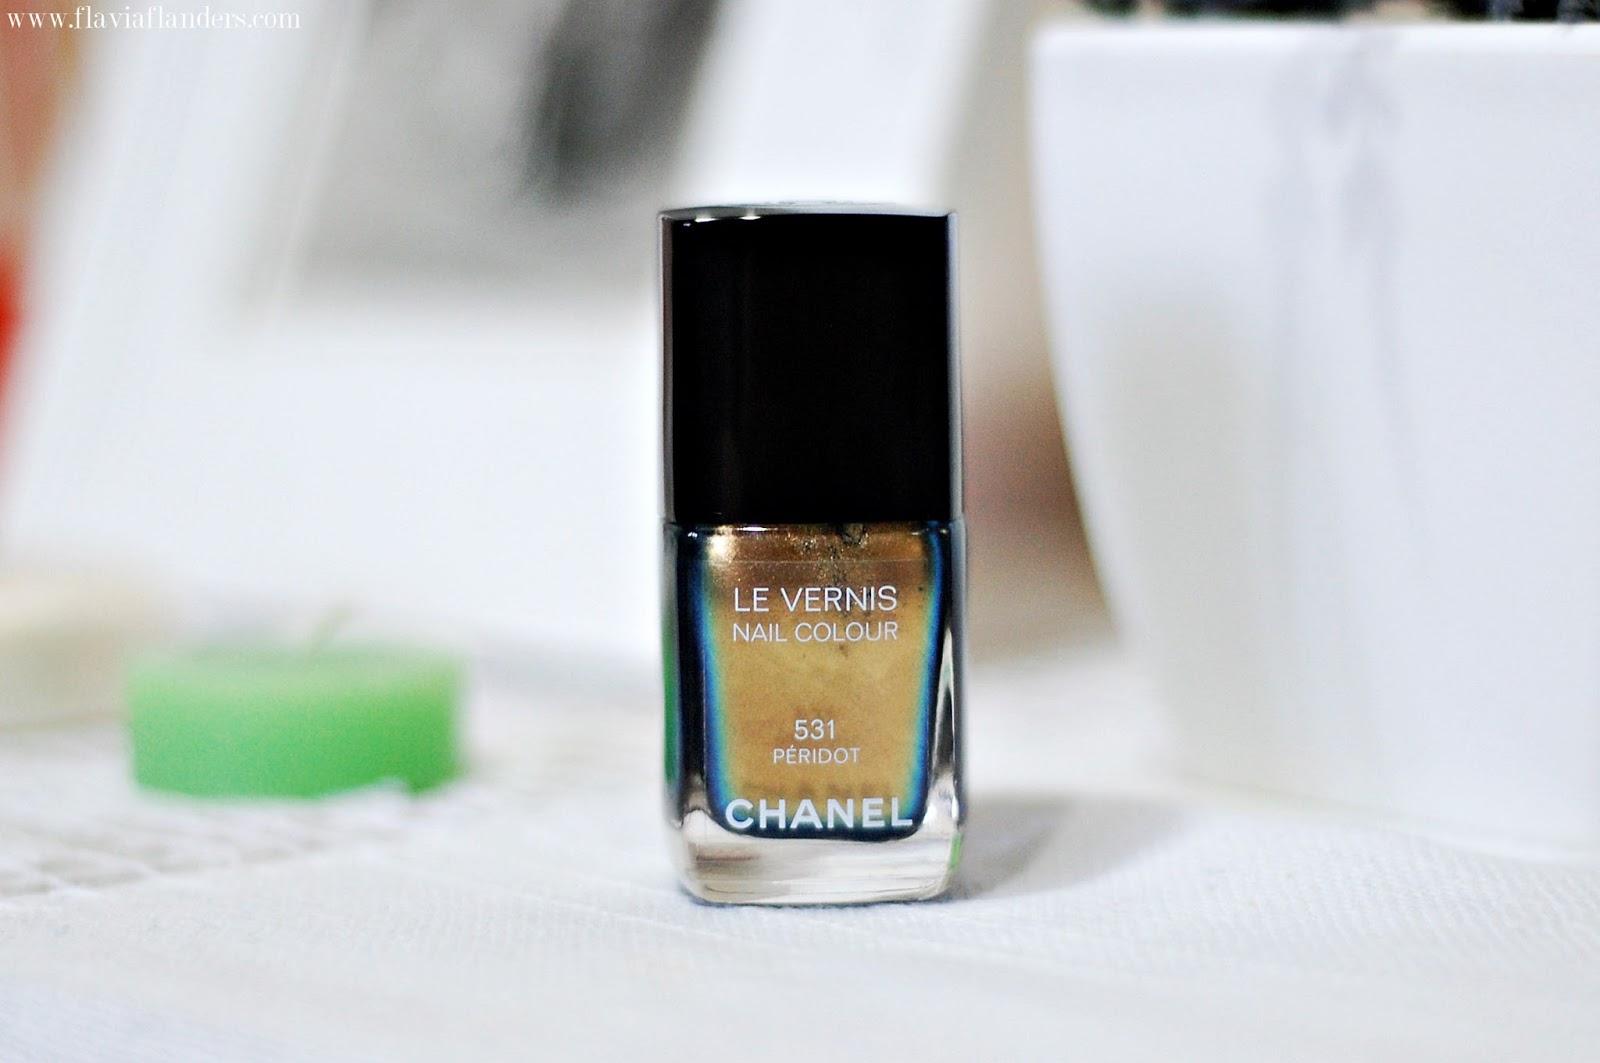 chanel, chanel nail polish, chanel peridot, chanel 531 peridot, peridot, 531 peridot, beauty, beauty blogger, beauty blogger argentina, flavia flanders, beauty guru, beauty guru argentina